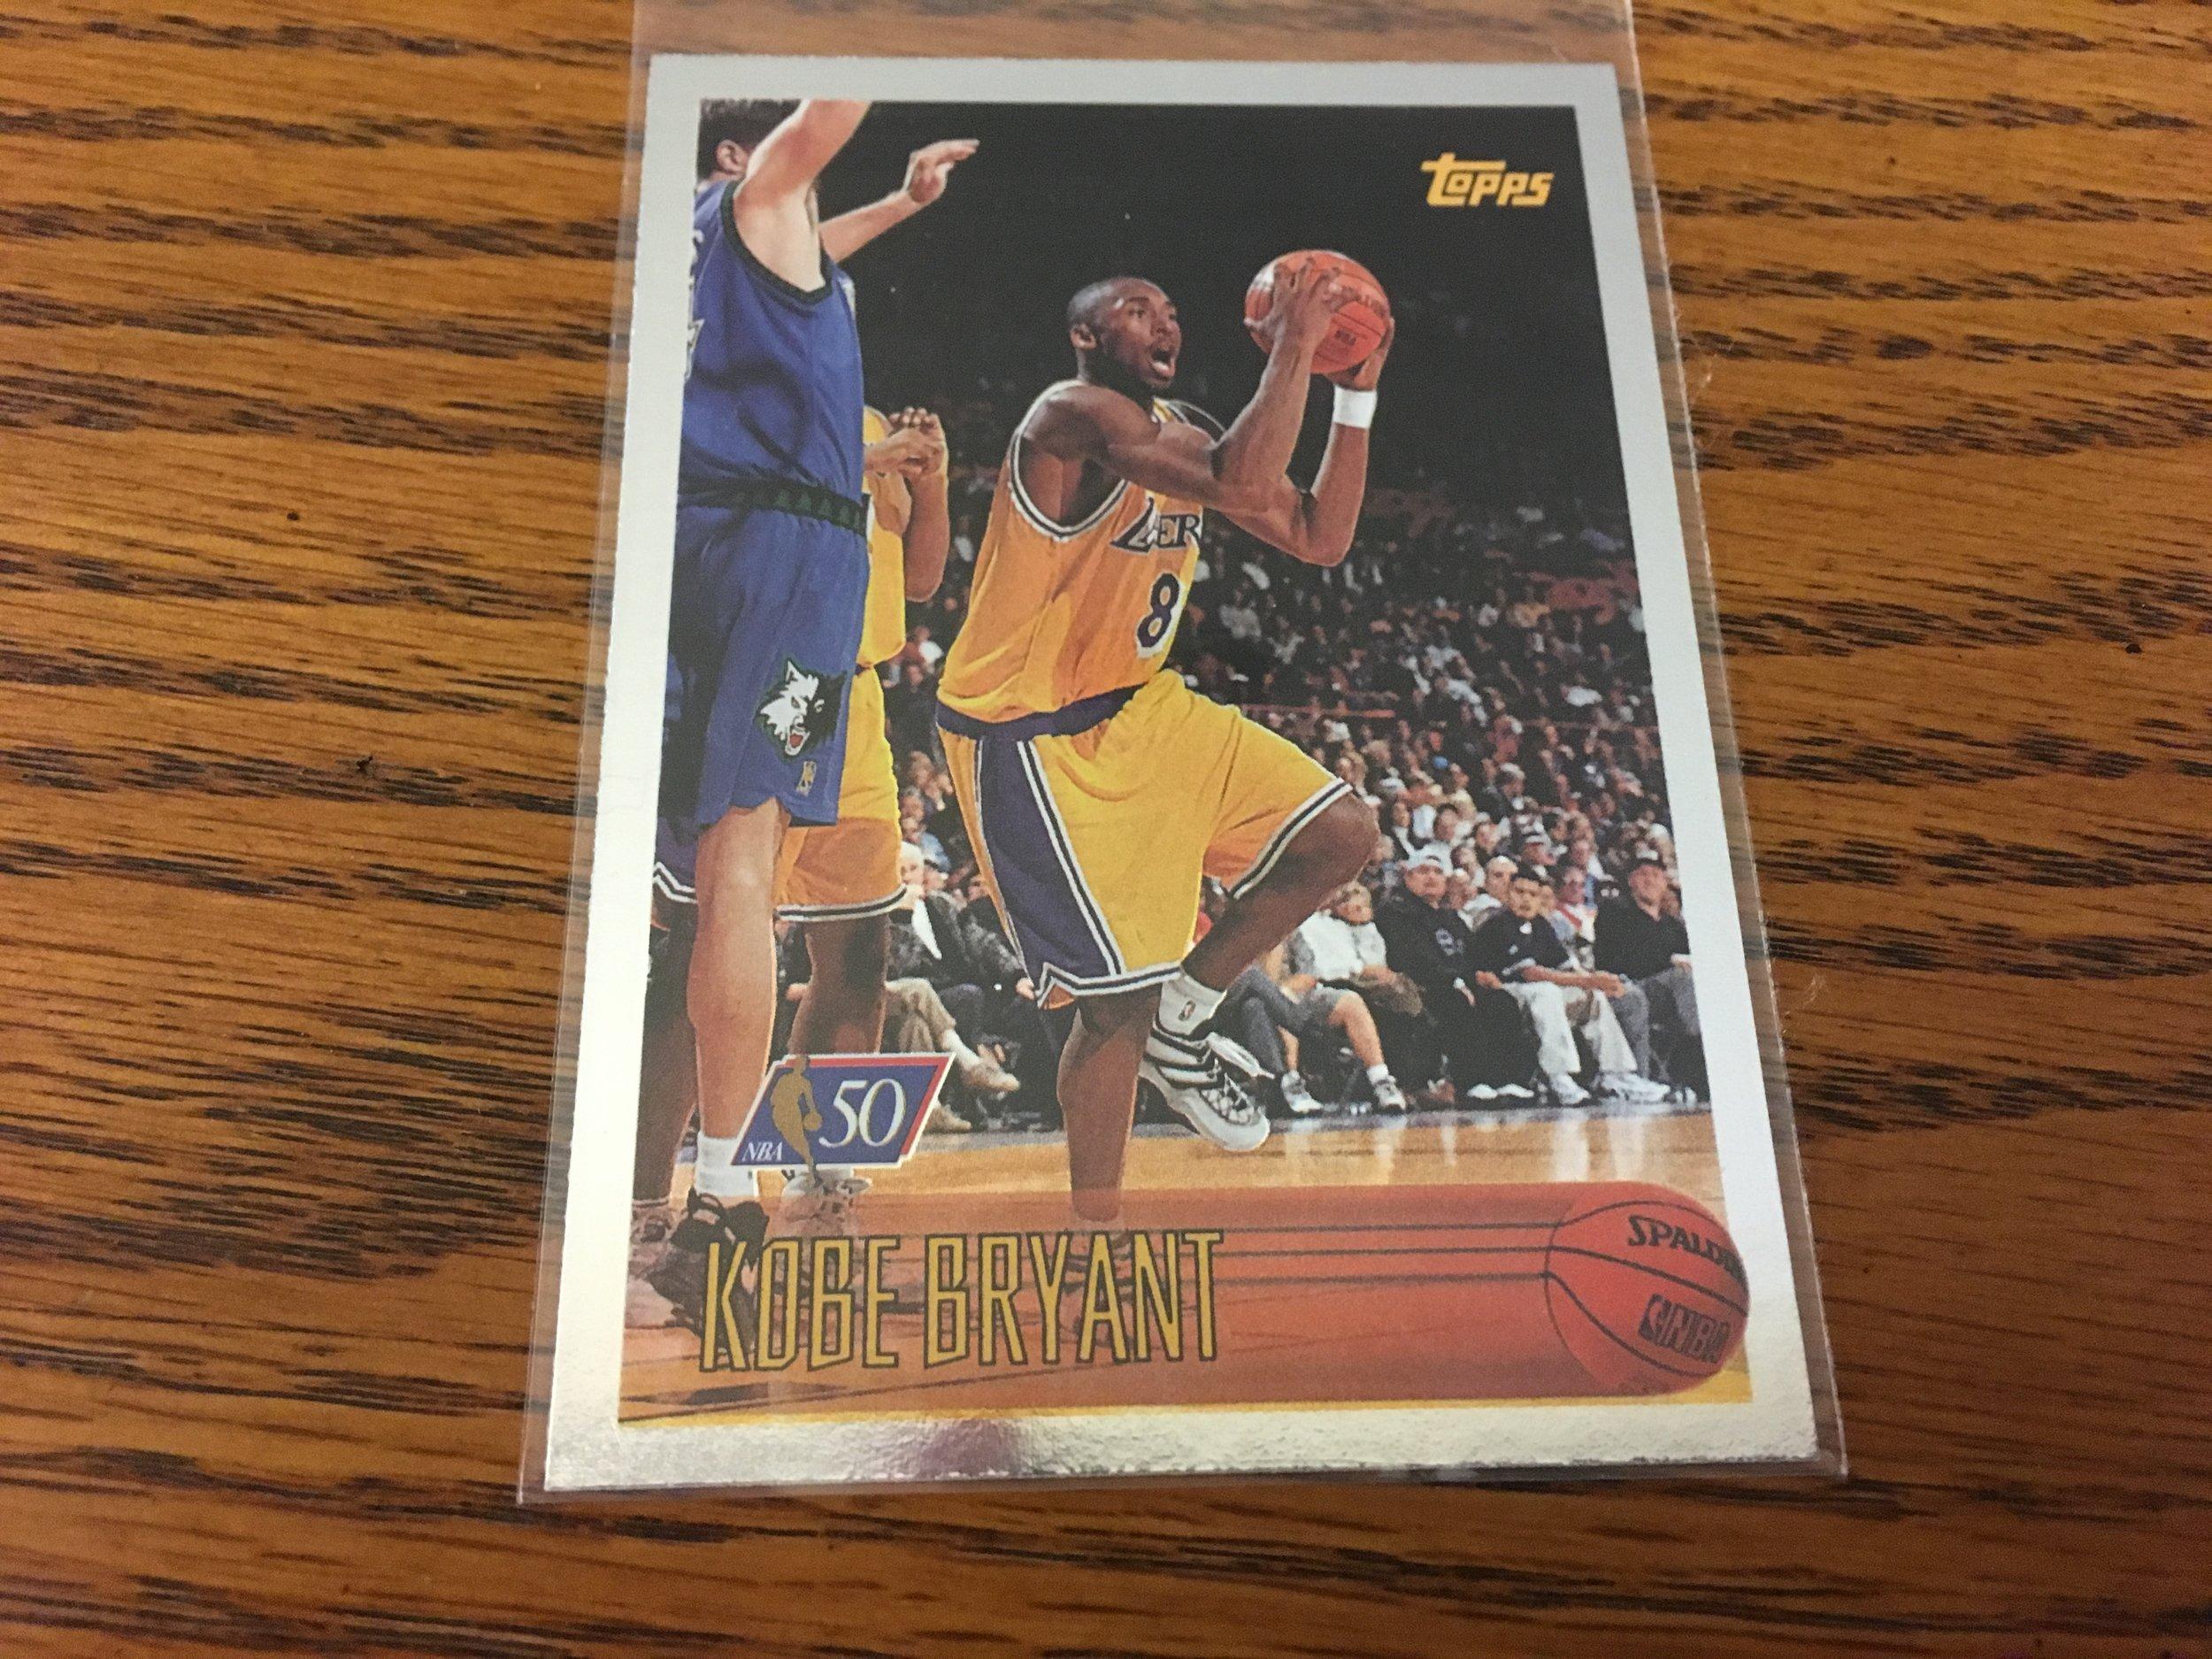 1996-97 Topps Kobe Bryant Rookie.JPG